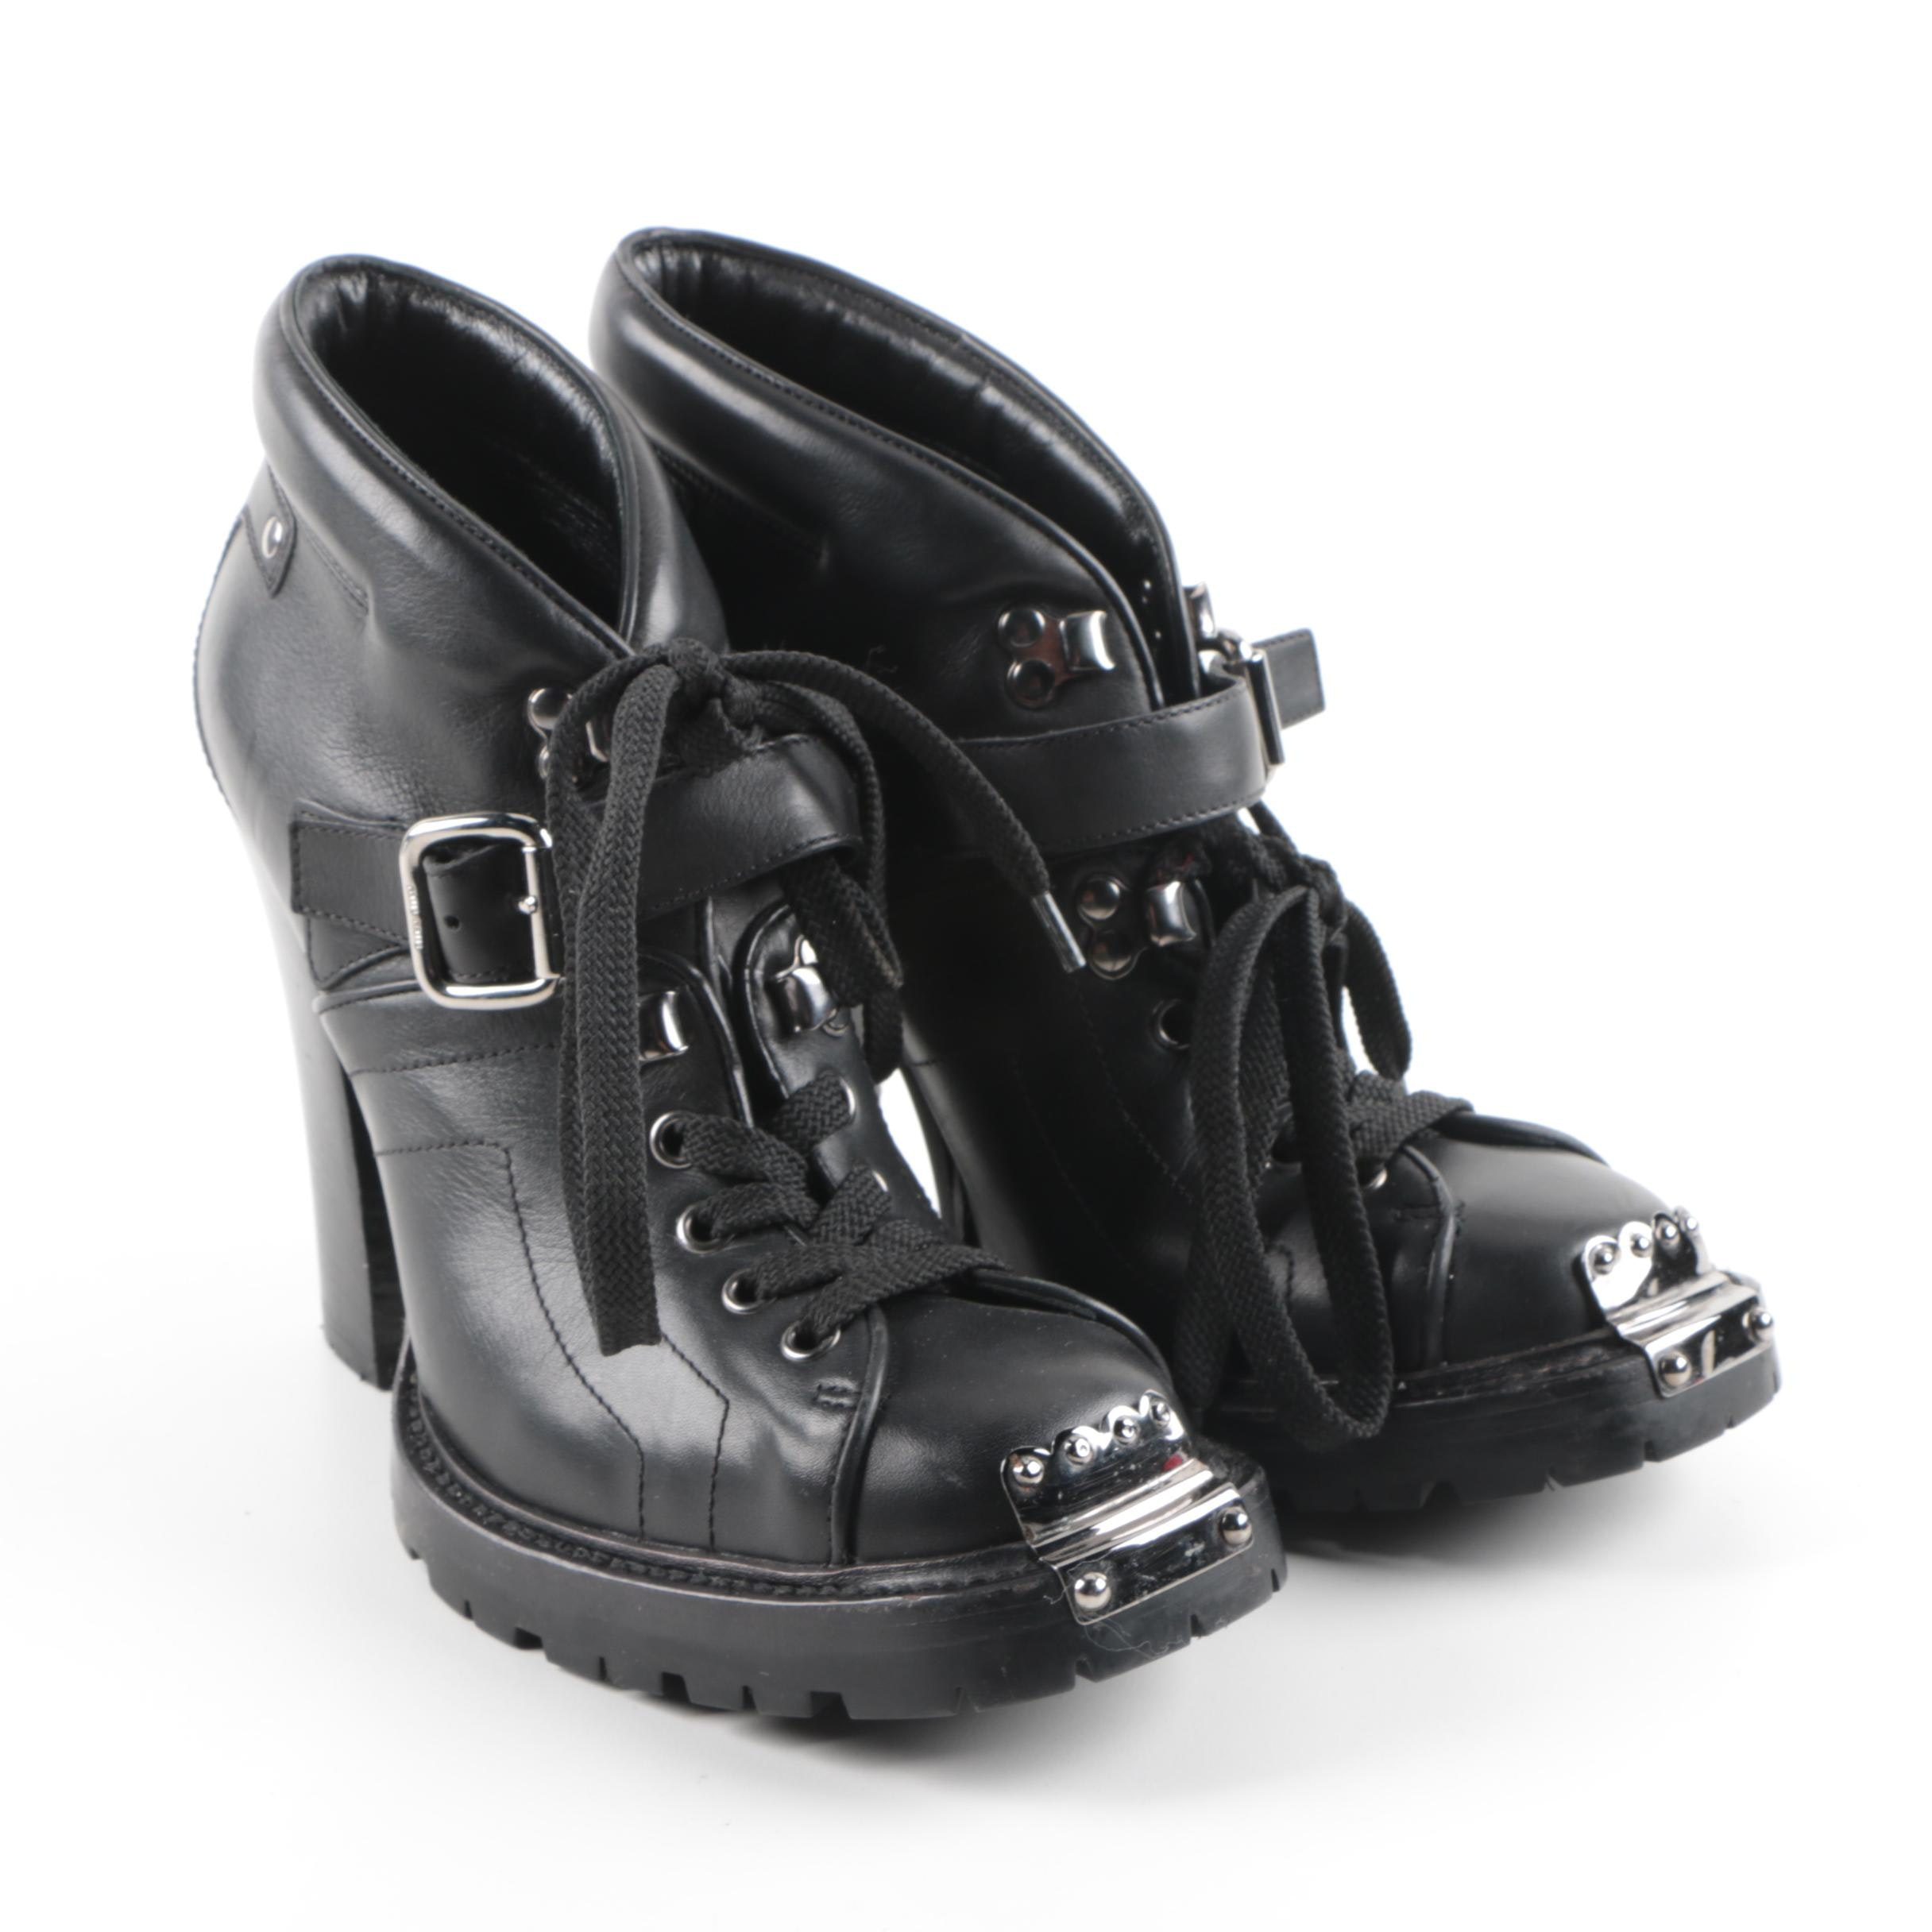 Women's MIU MIU Black Leather Ankle Boots